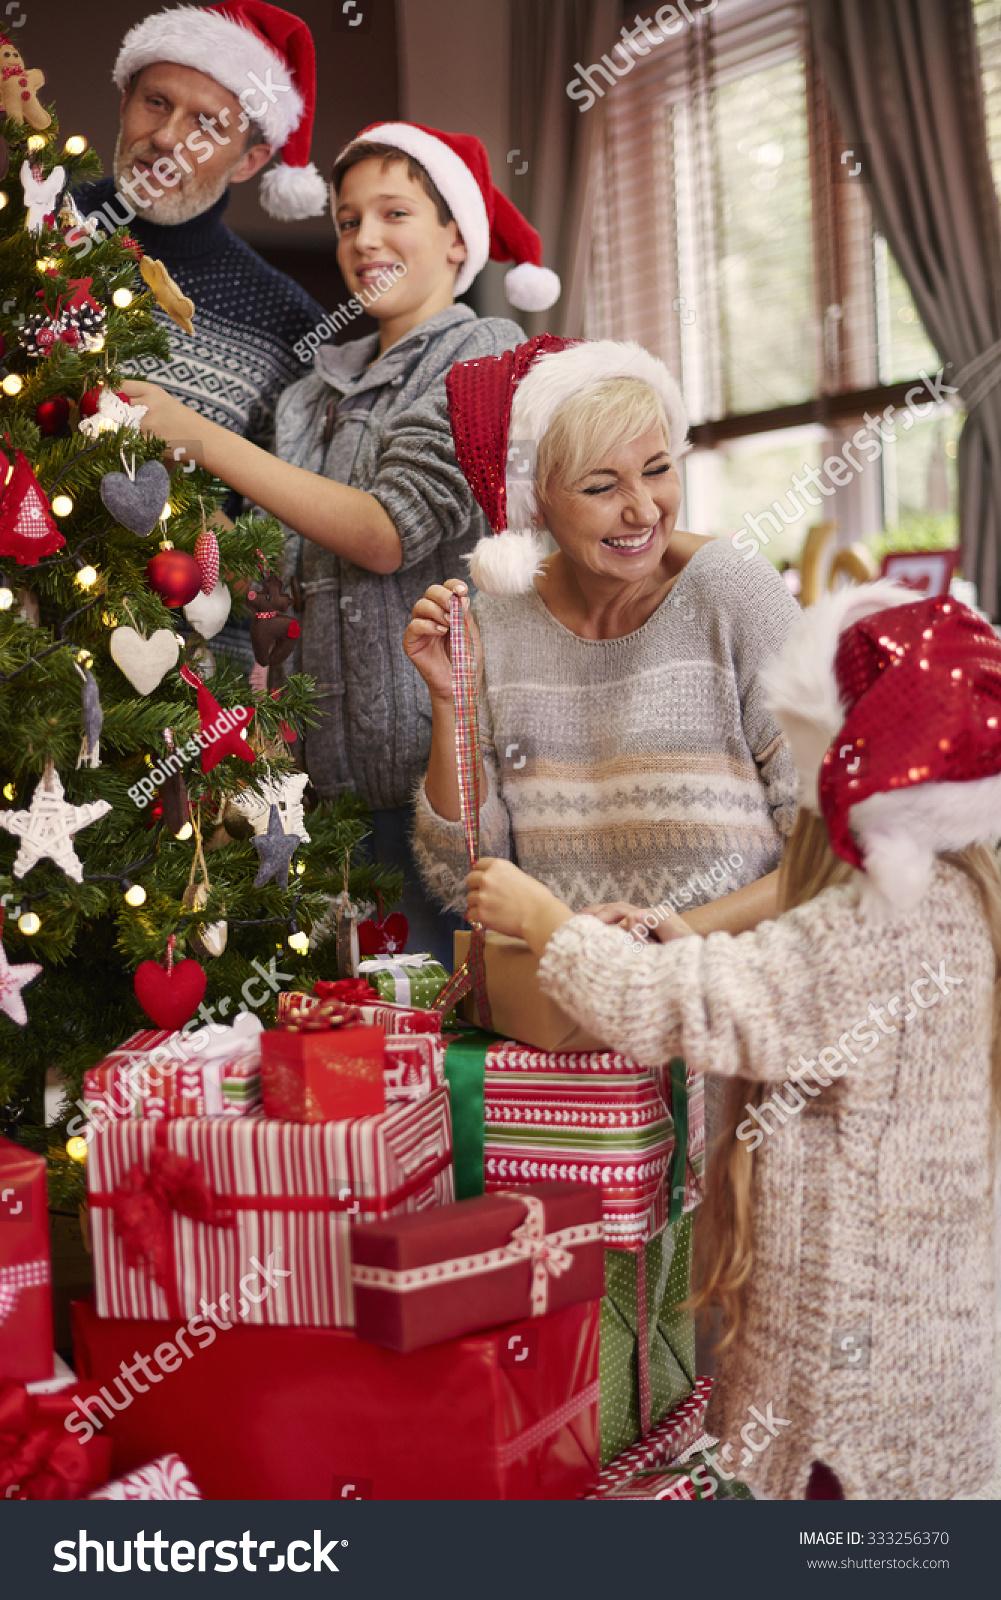 Great Fun Dressing Christmas Tree Stock Photo 333256370 - Shutterstock